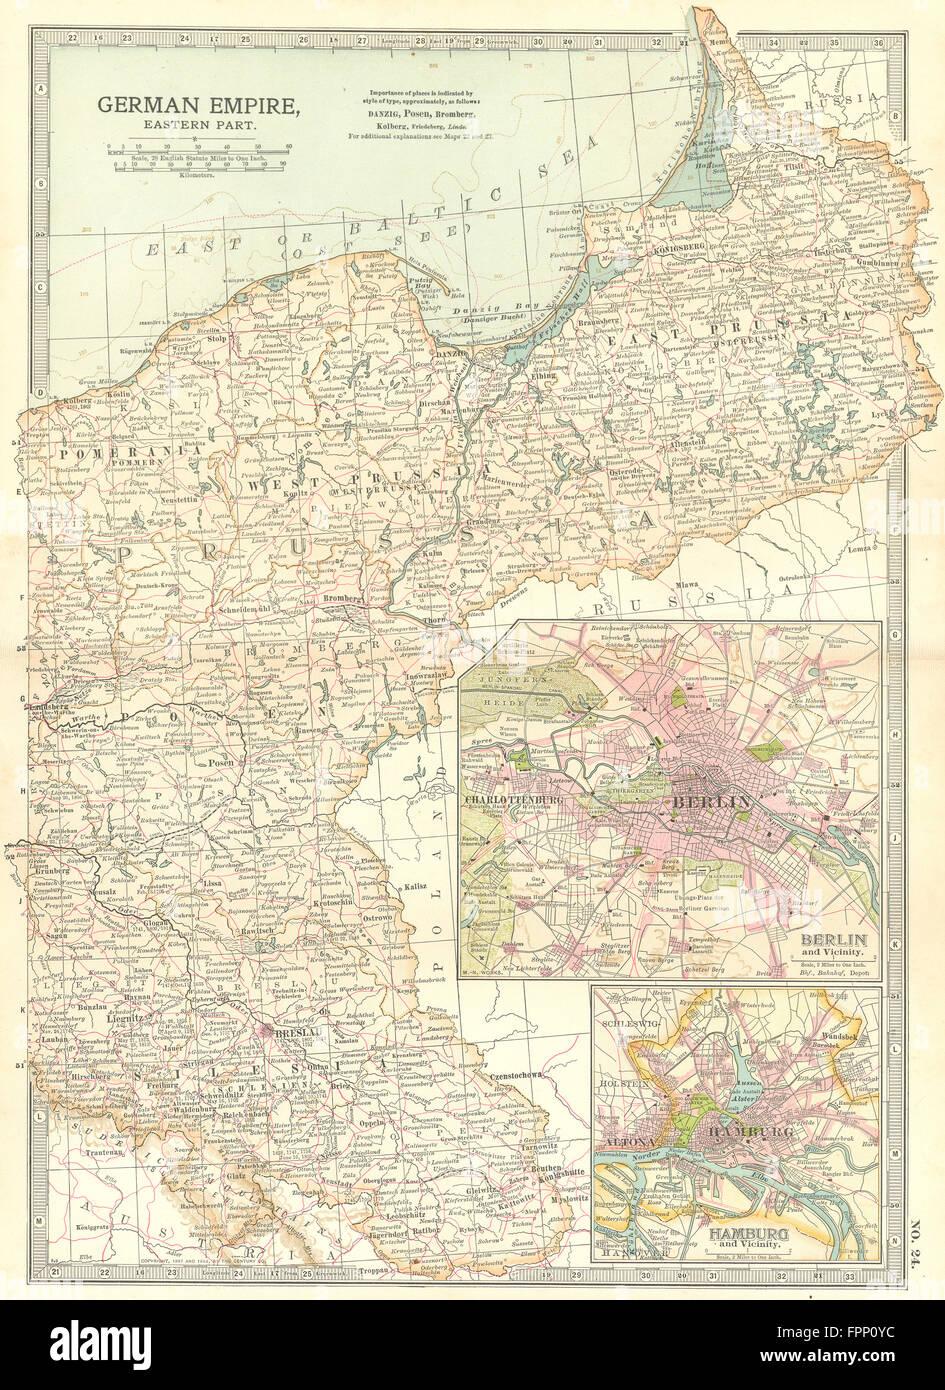 PRUSSIA POLAND POSEN SILESIA: Berlin Hamburg.Shows battlefields/dates, 1903 map - Stock Image